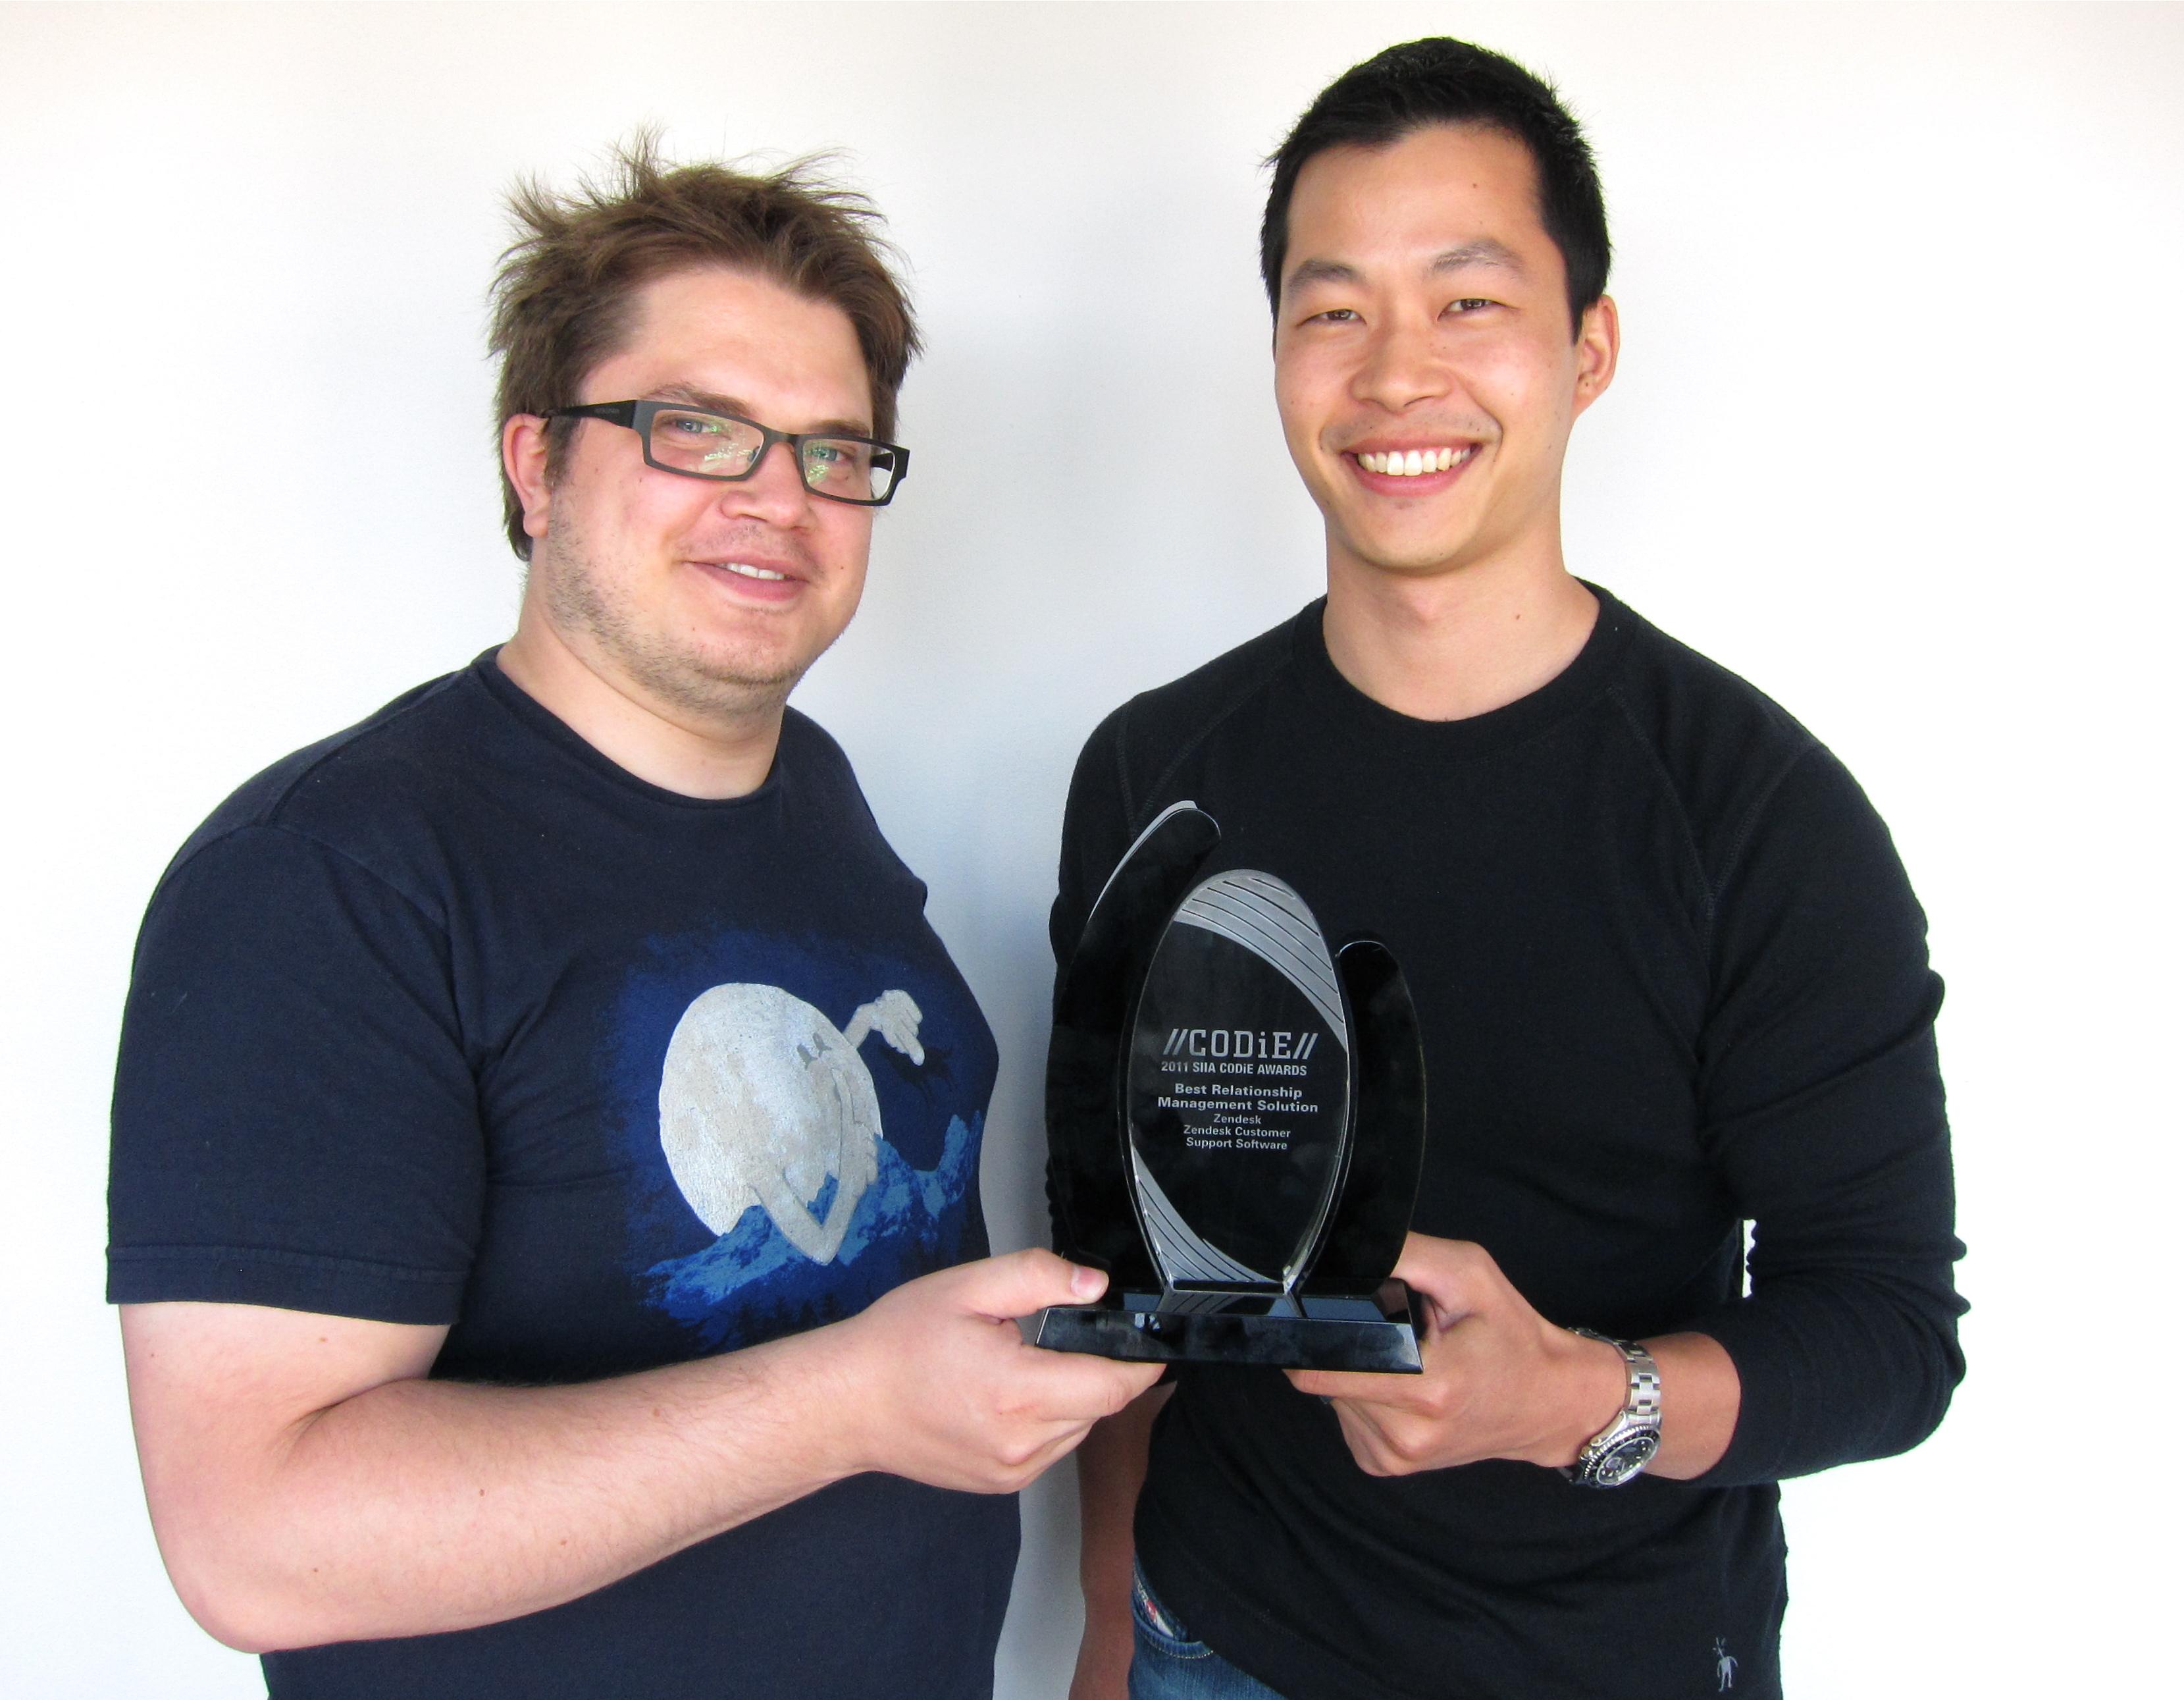 Best CRM award